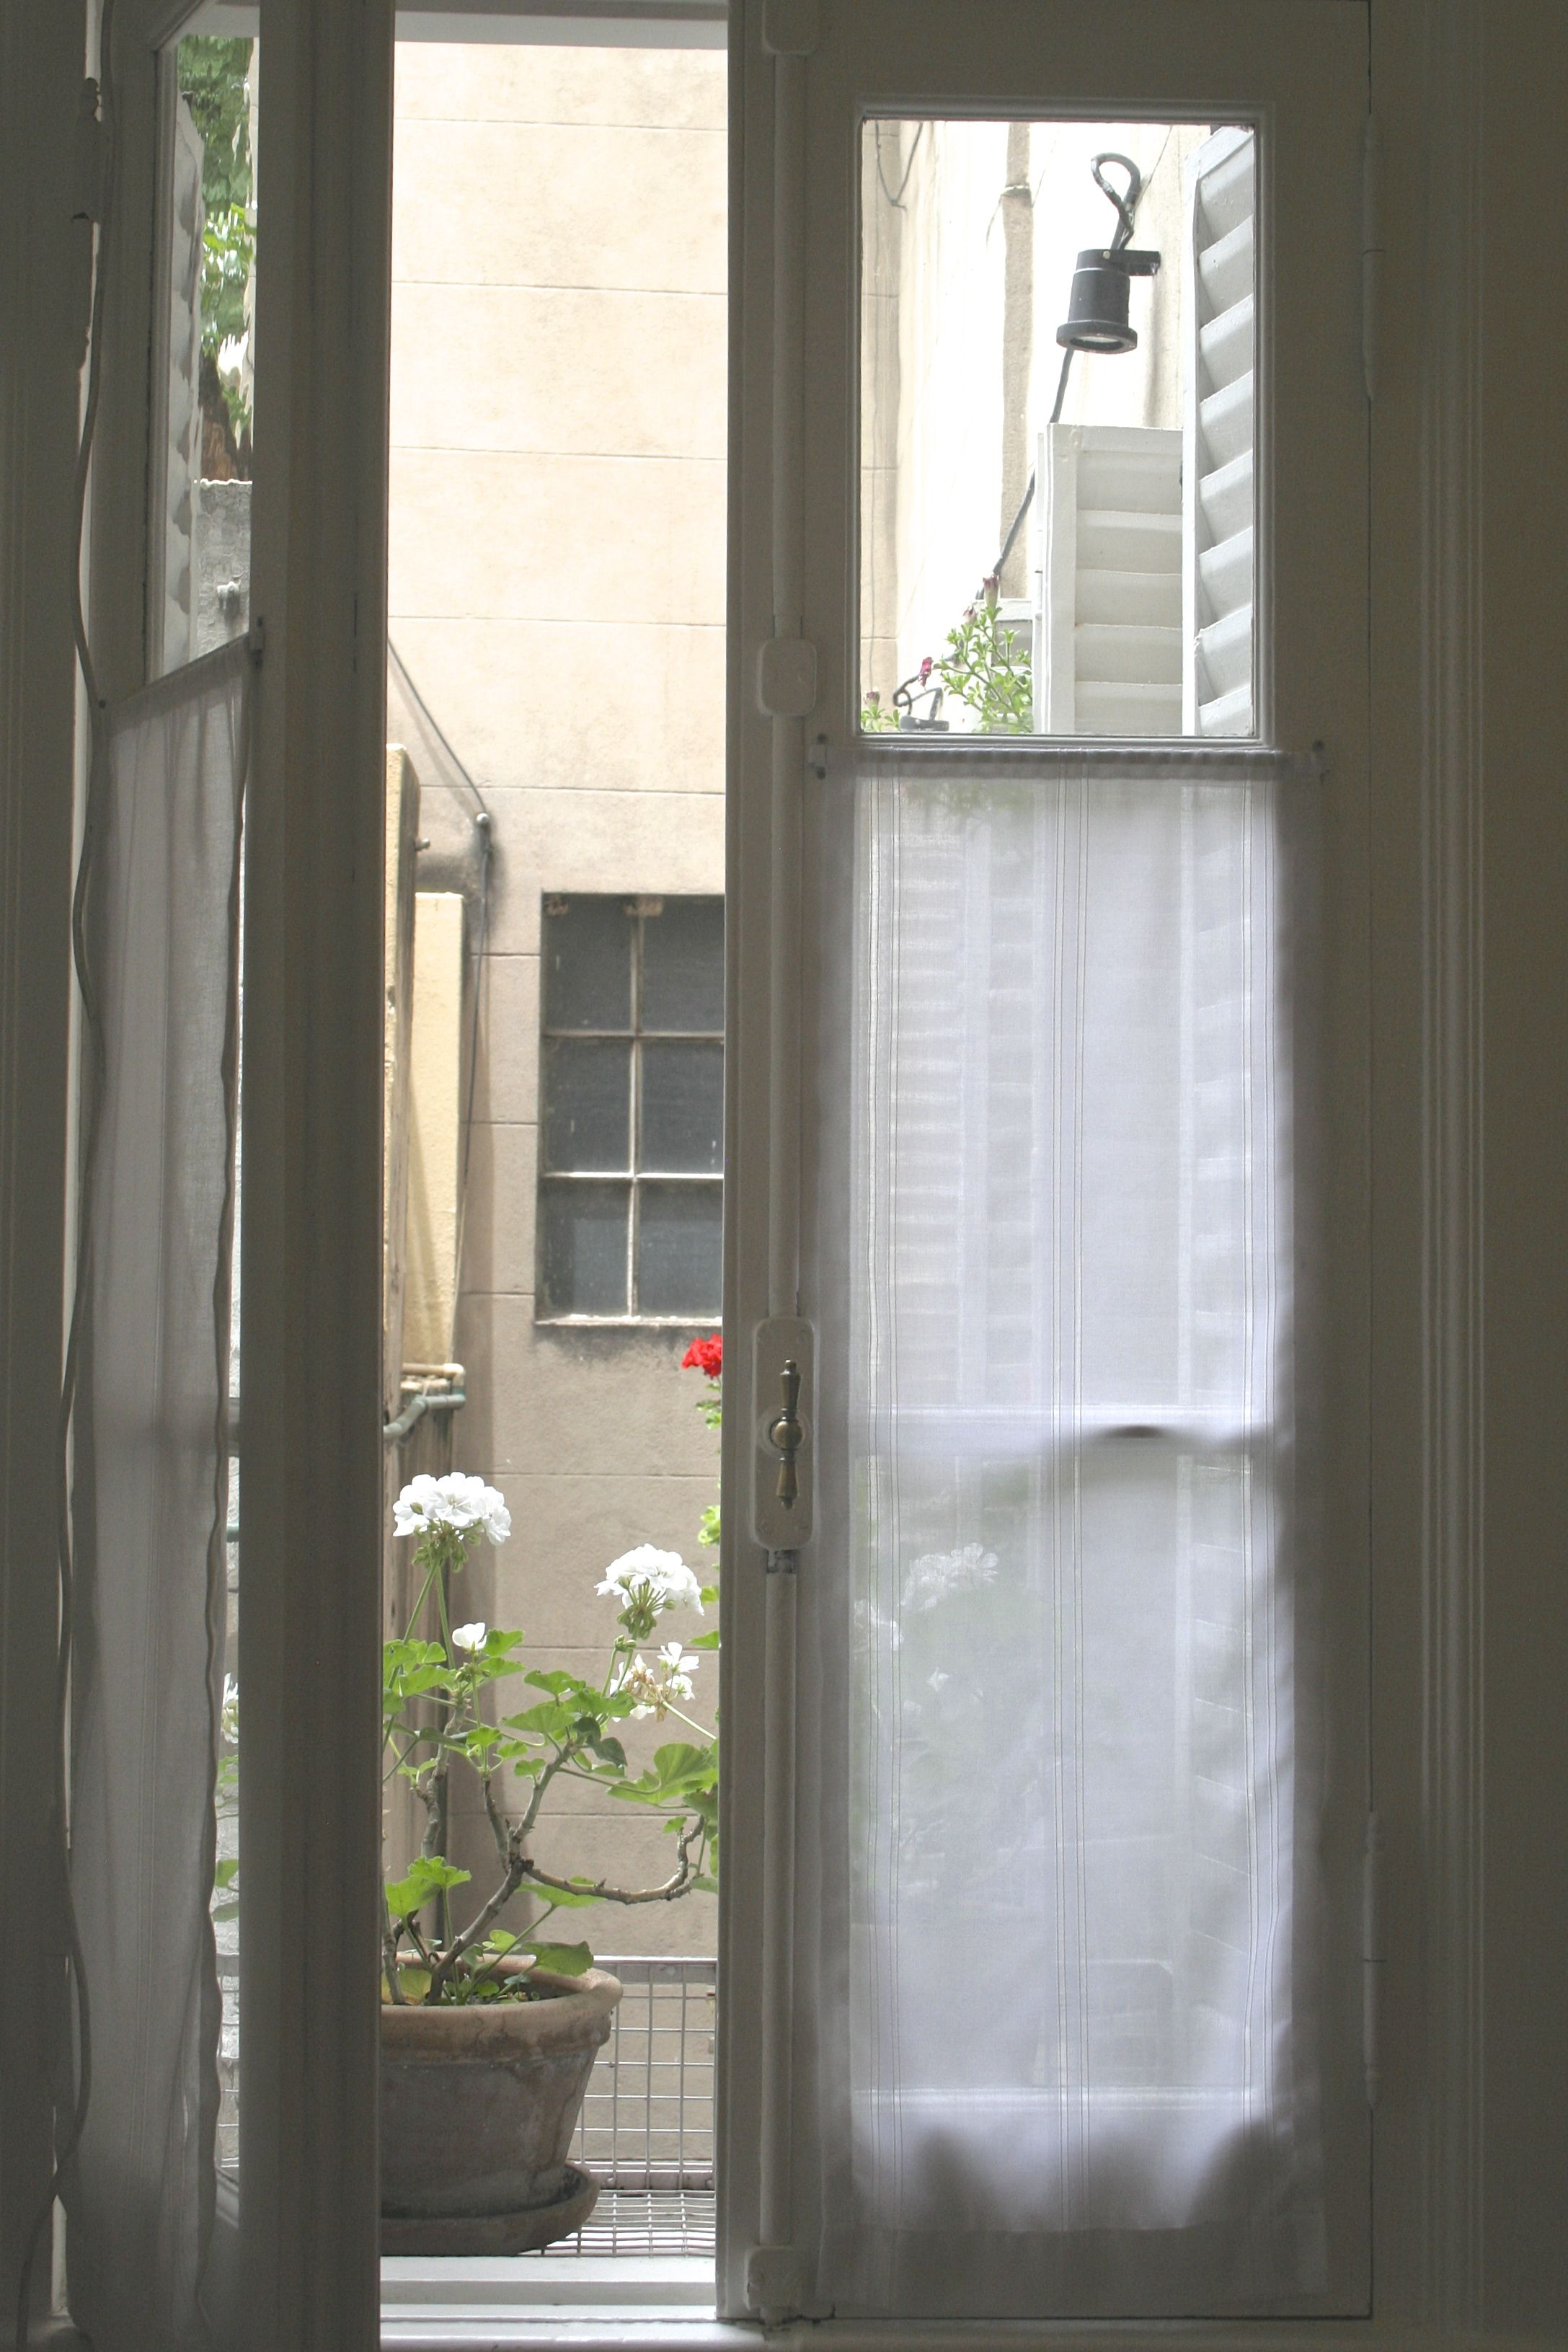 Visillos De Gasa Con Fantasia Para Ventana Antigua De Madera  ~ Cortinas Para Dormitorio Principal